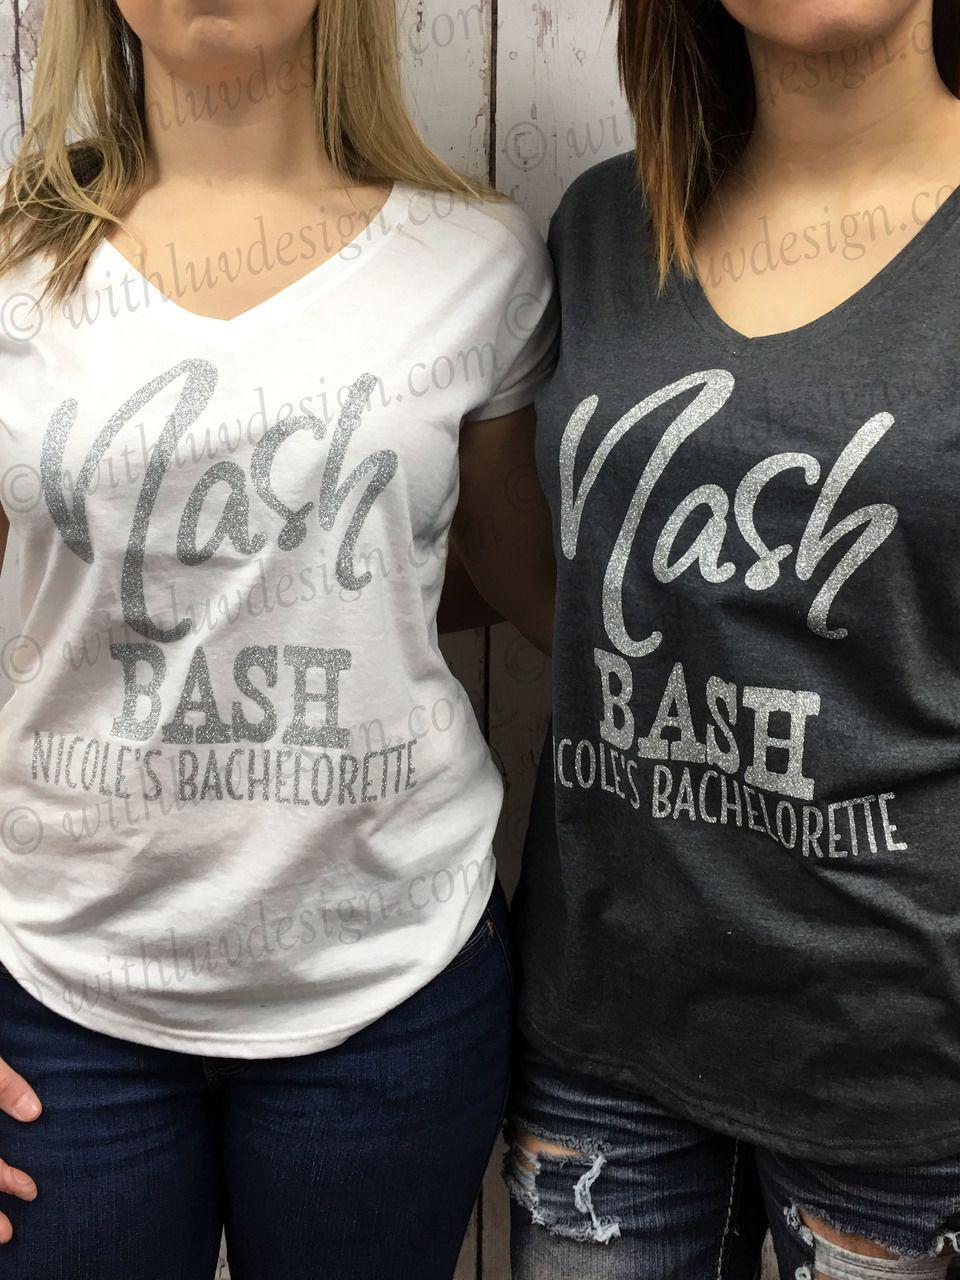 Nash Bash Custom Bulk Bridal Party Vnecks Bachelorette Party